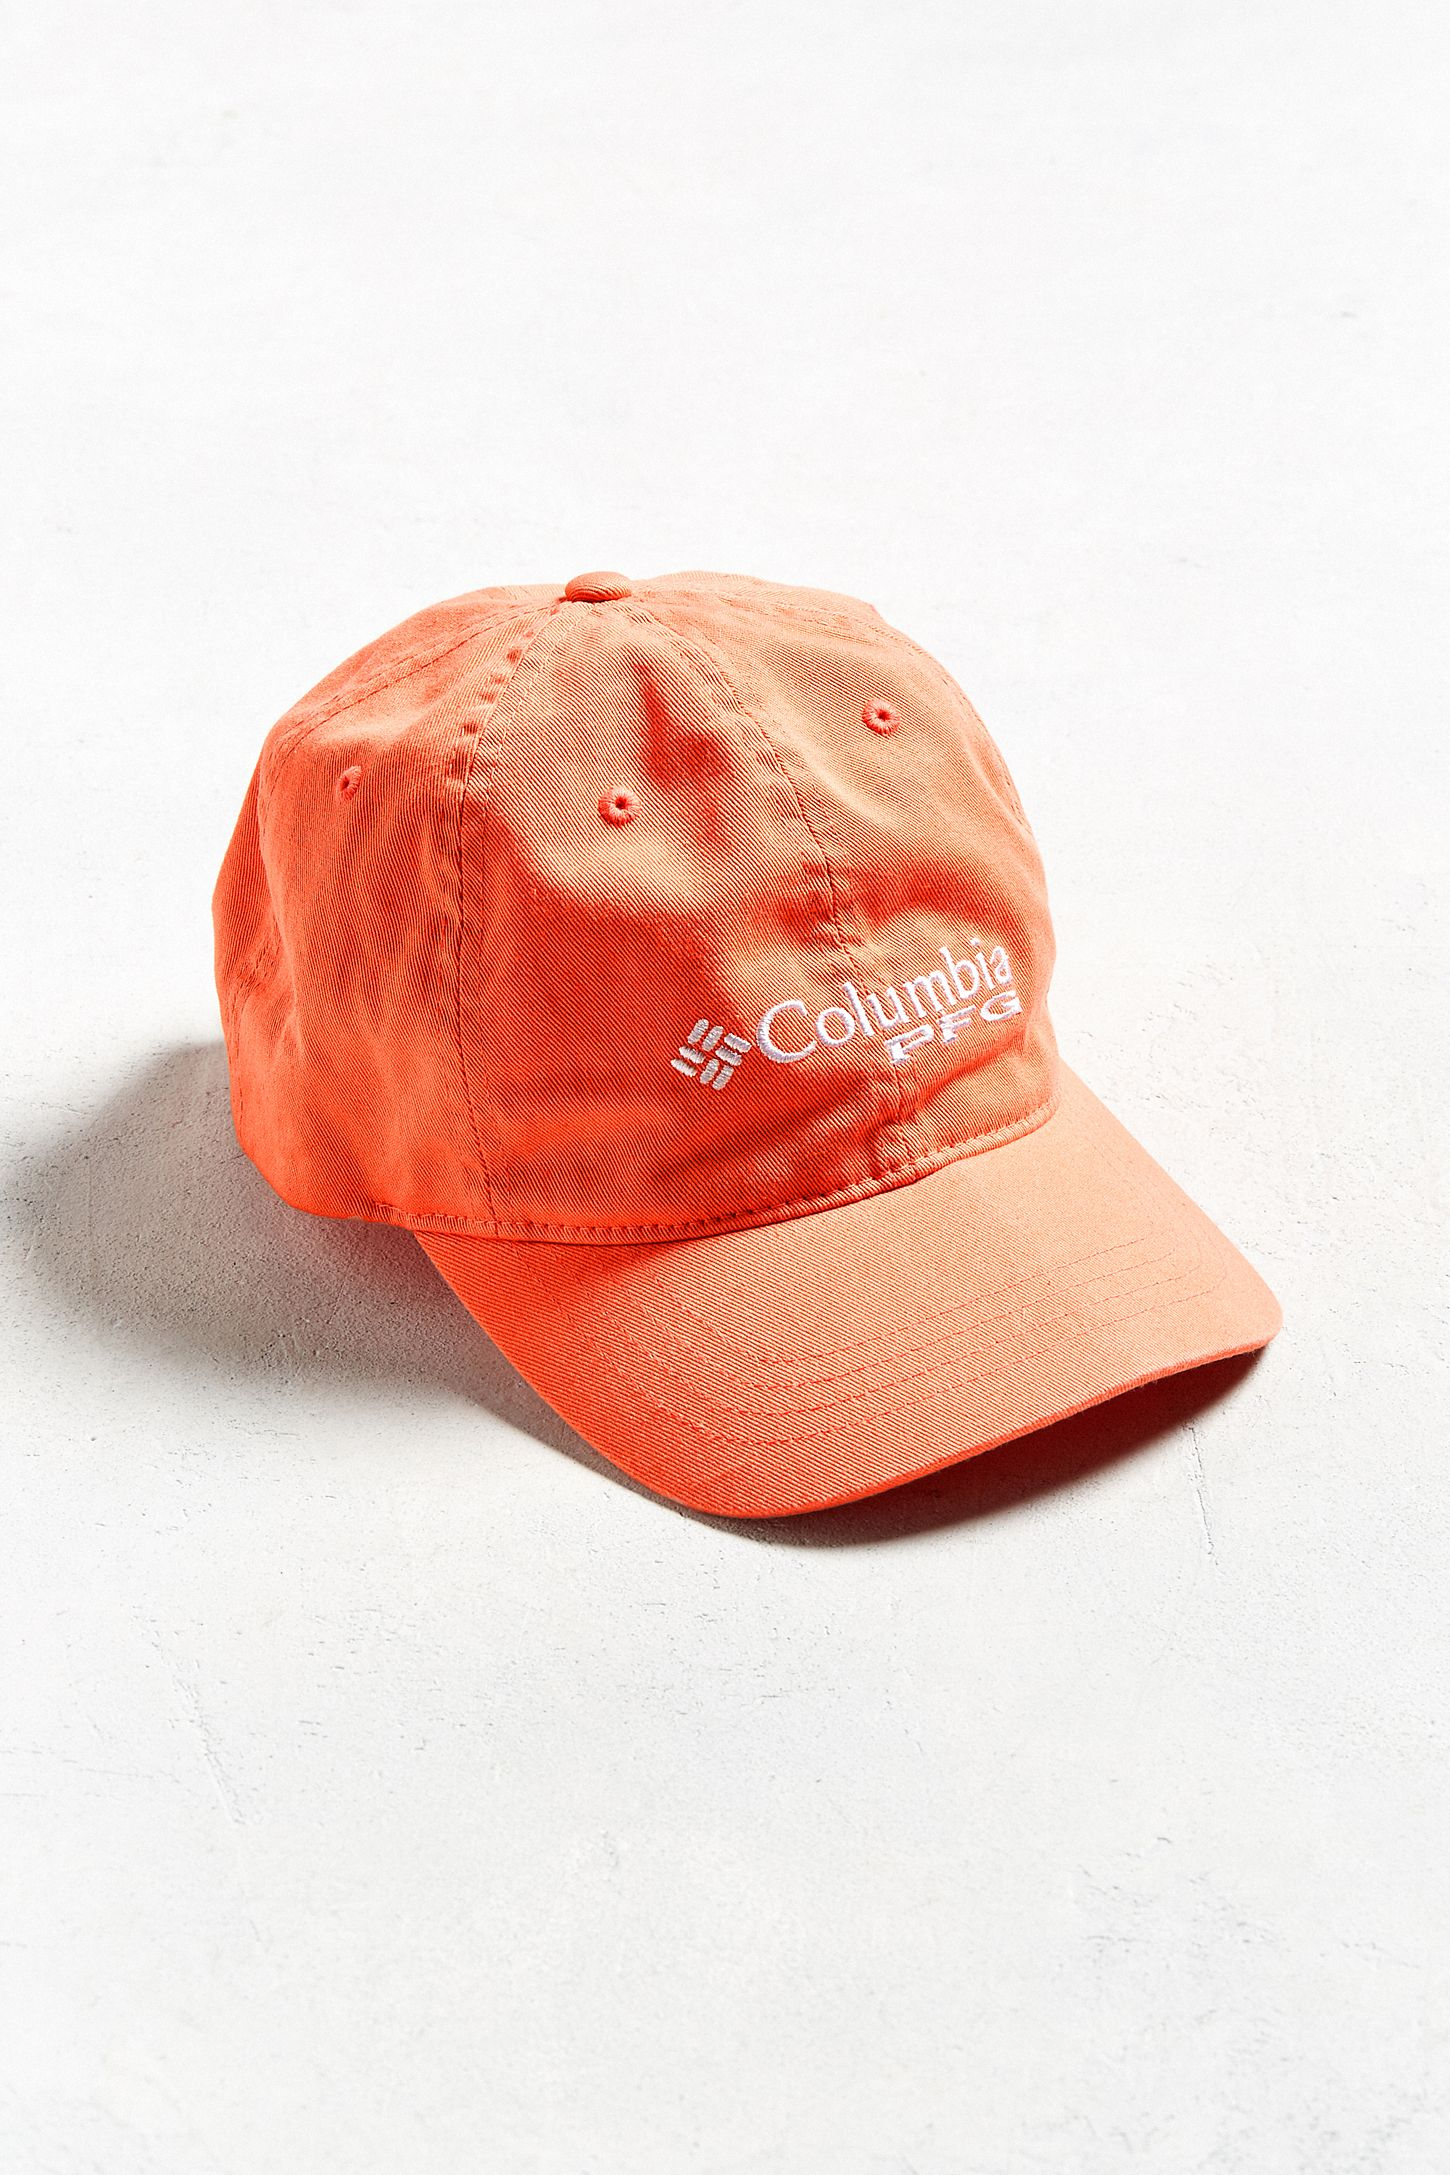 Columbia PFG Bonehead Hat  c8ce6d53ed11